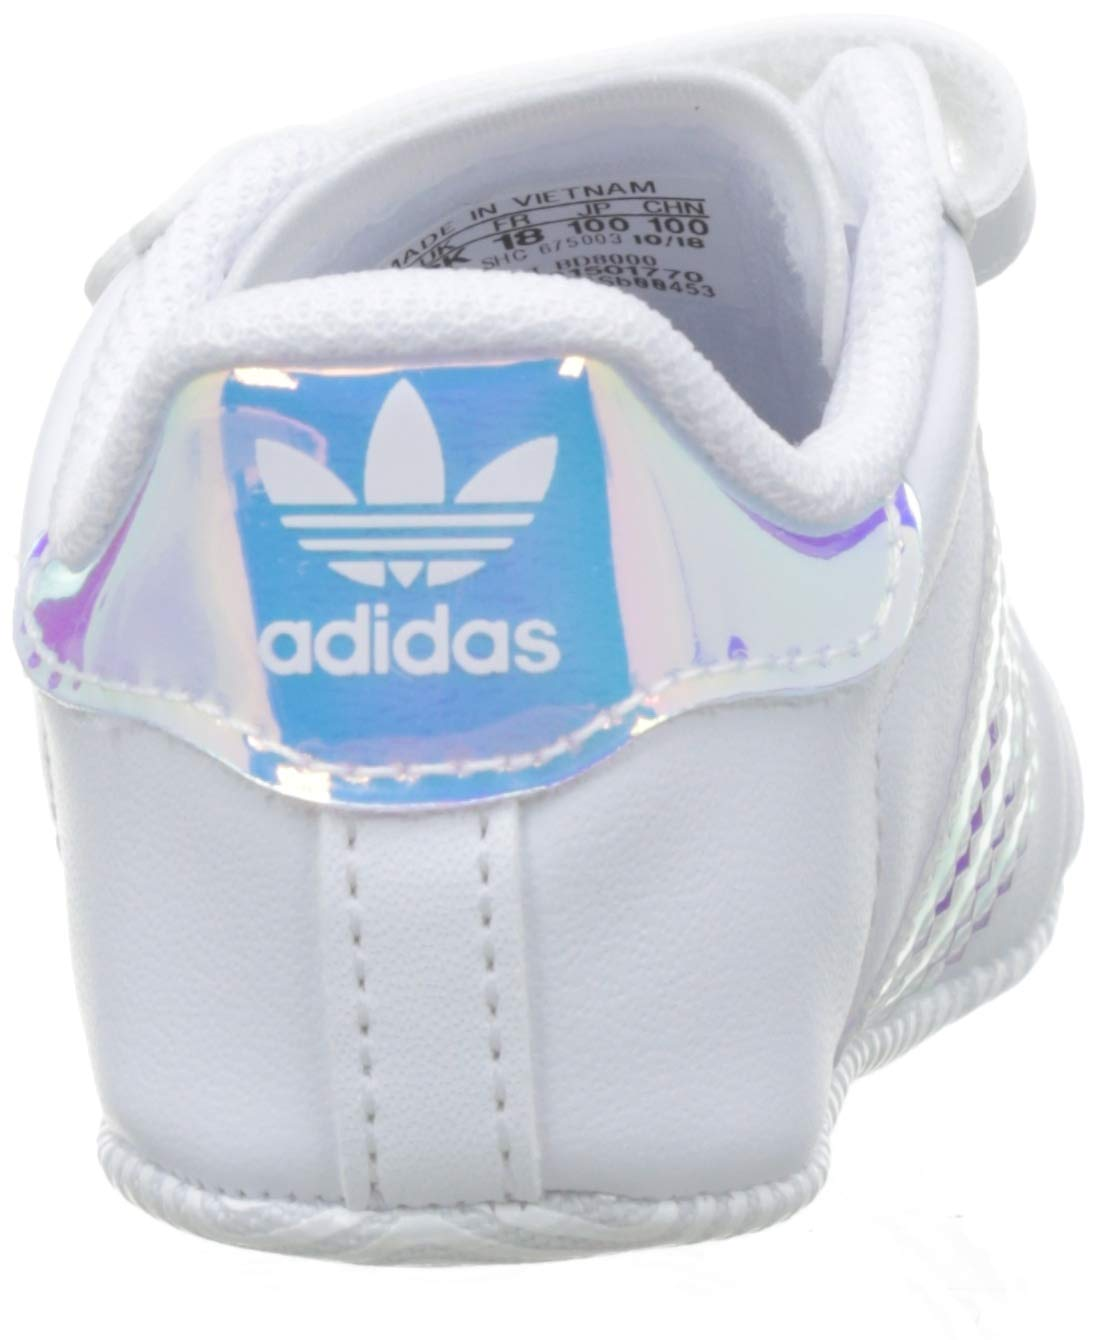 adidas Superstar, Scarpe Unisex – Bambini 2 spesavip